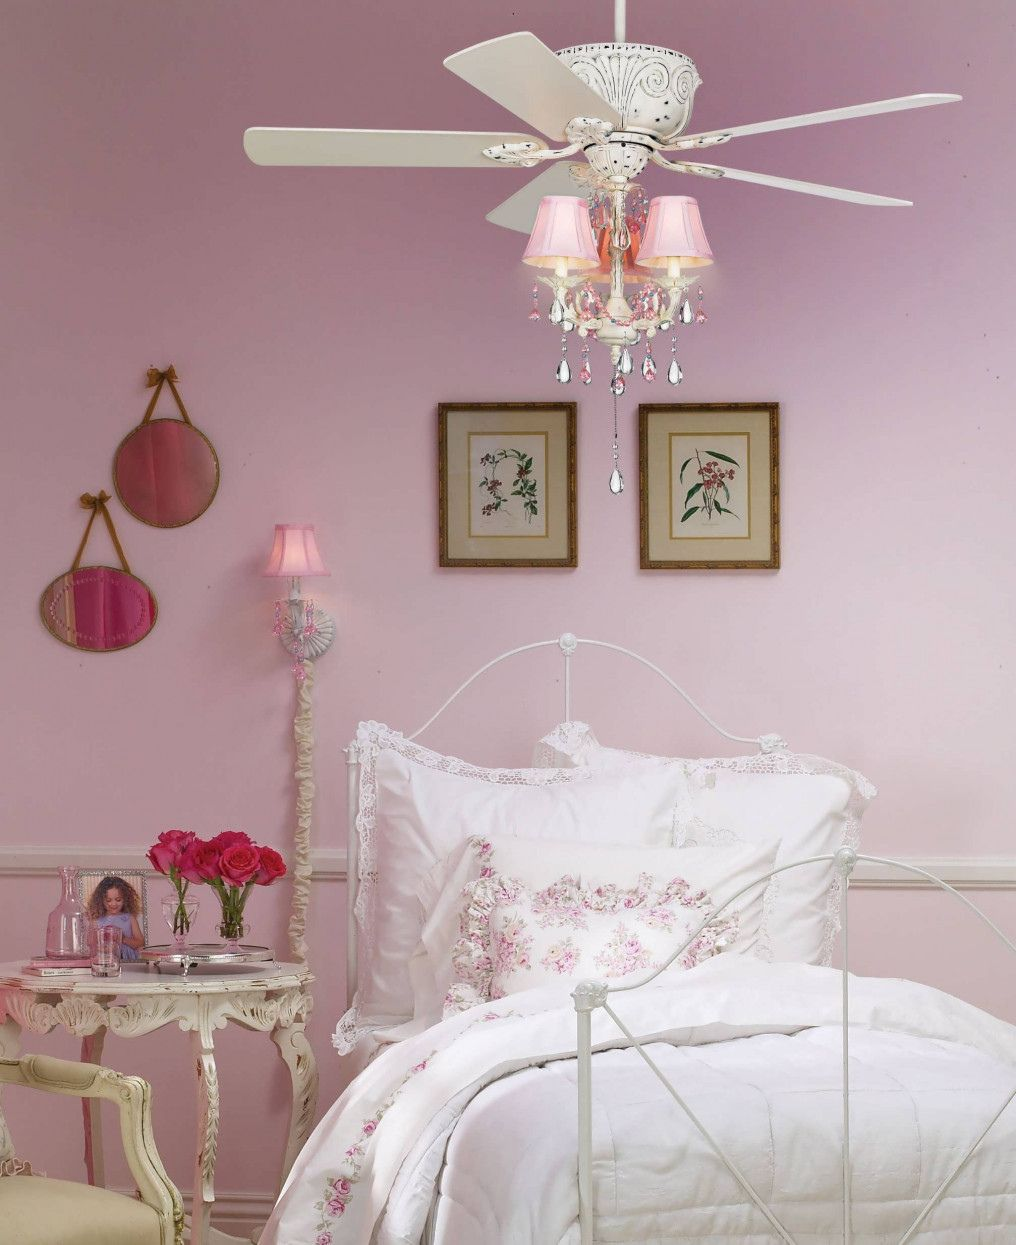 20 Bedroom Chandelier Designs Decorating Ideas: 2018 Small Chandelier For Girls Room